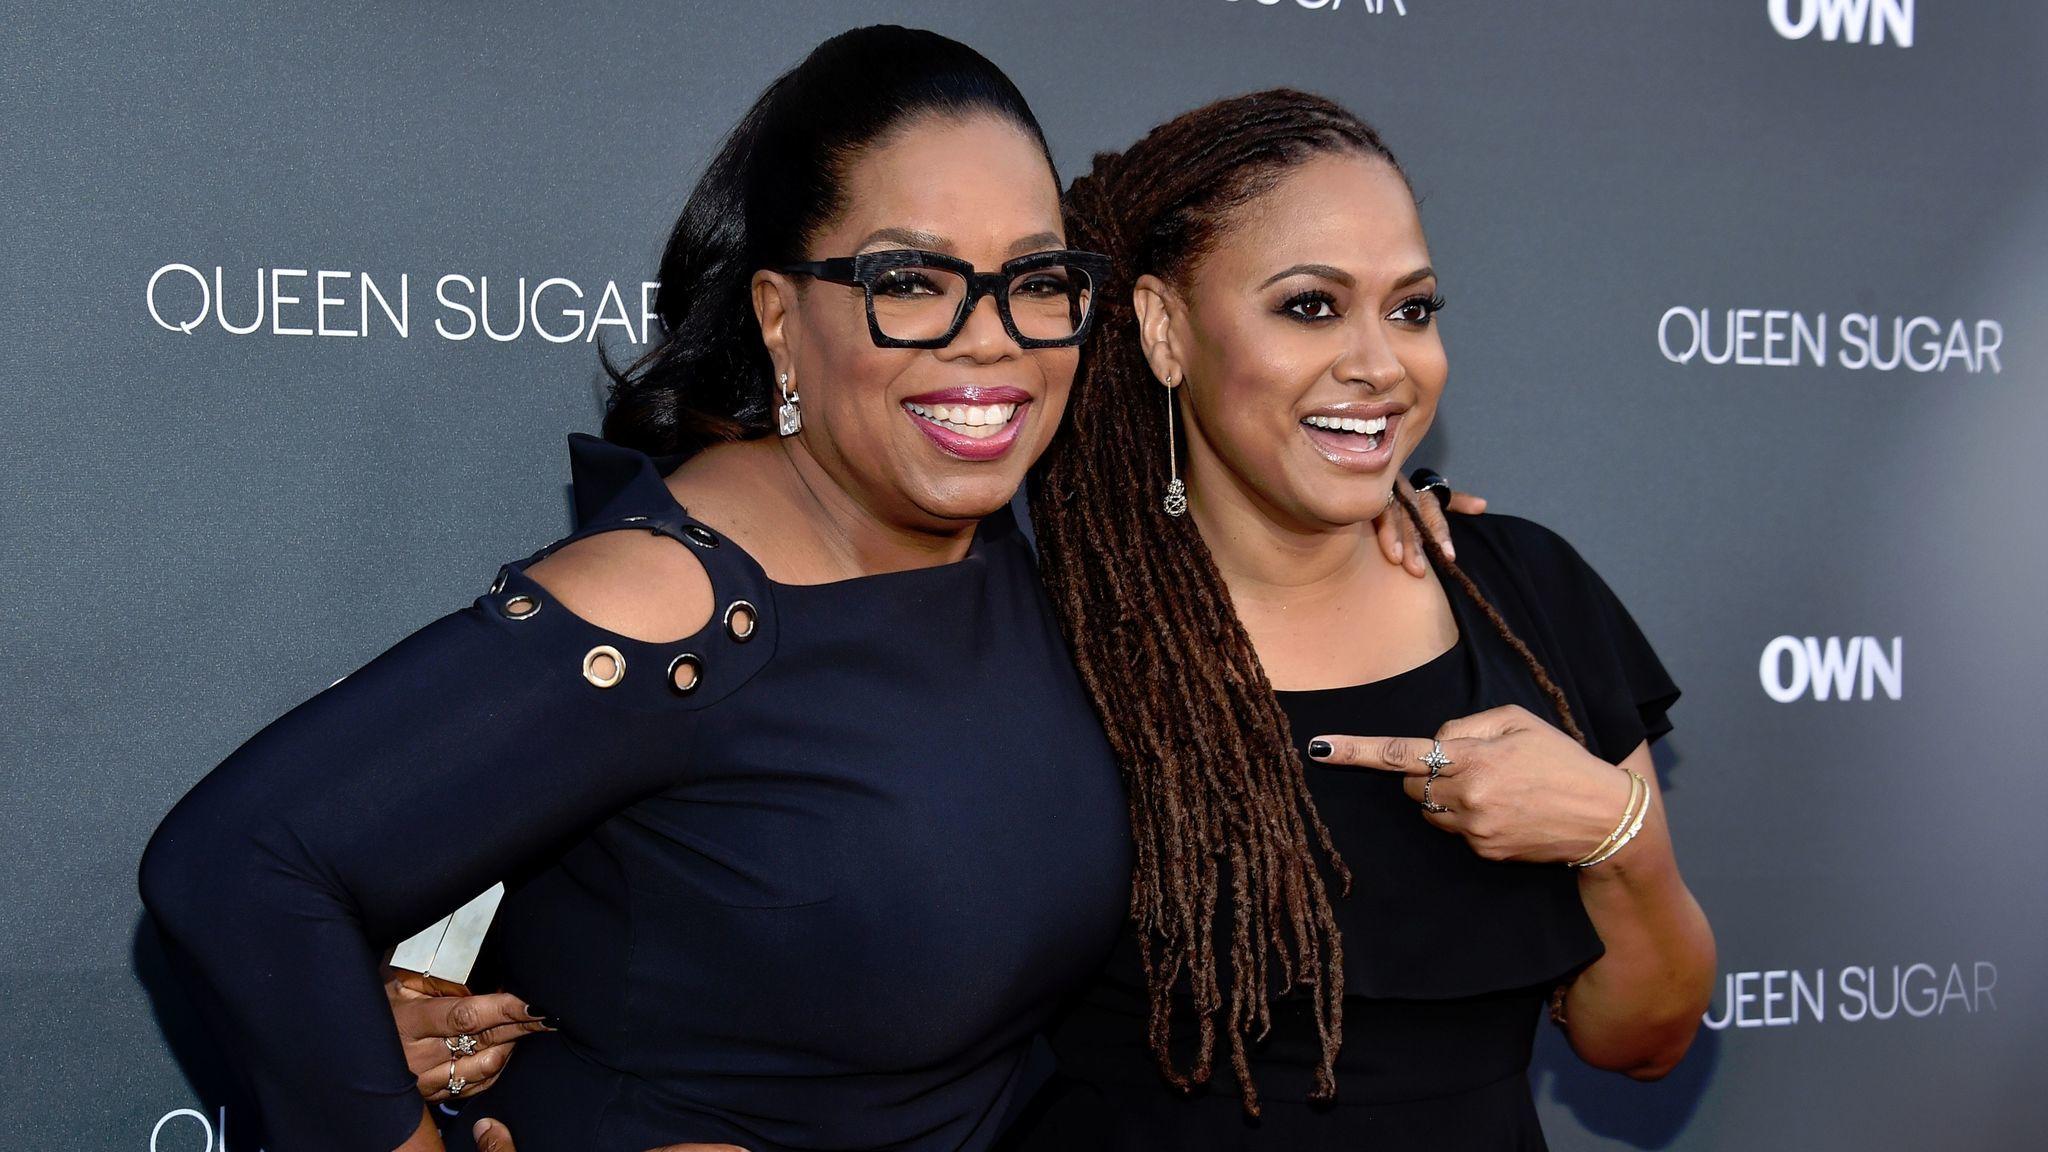 Oprah Winfrey, left, and Ava DuVernay at the Warner Bros. Studio Lot Steven J. Ross Theater on Aug.29, 2016 in Burbank, Calif.